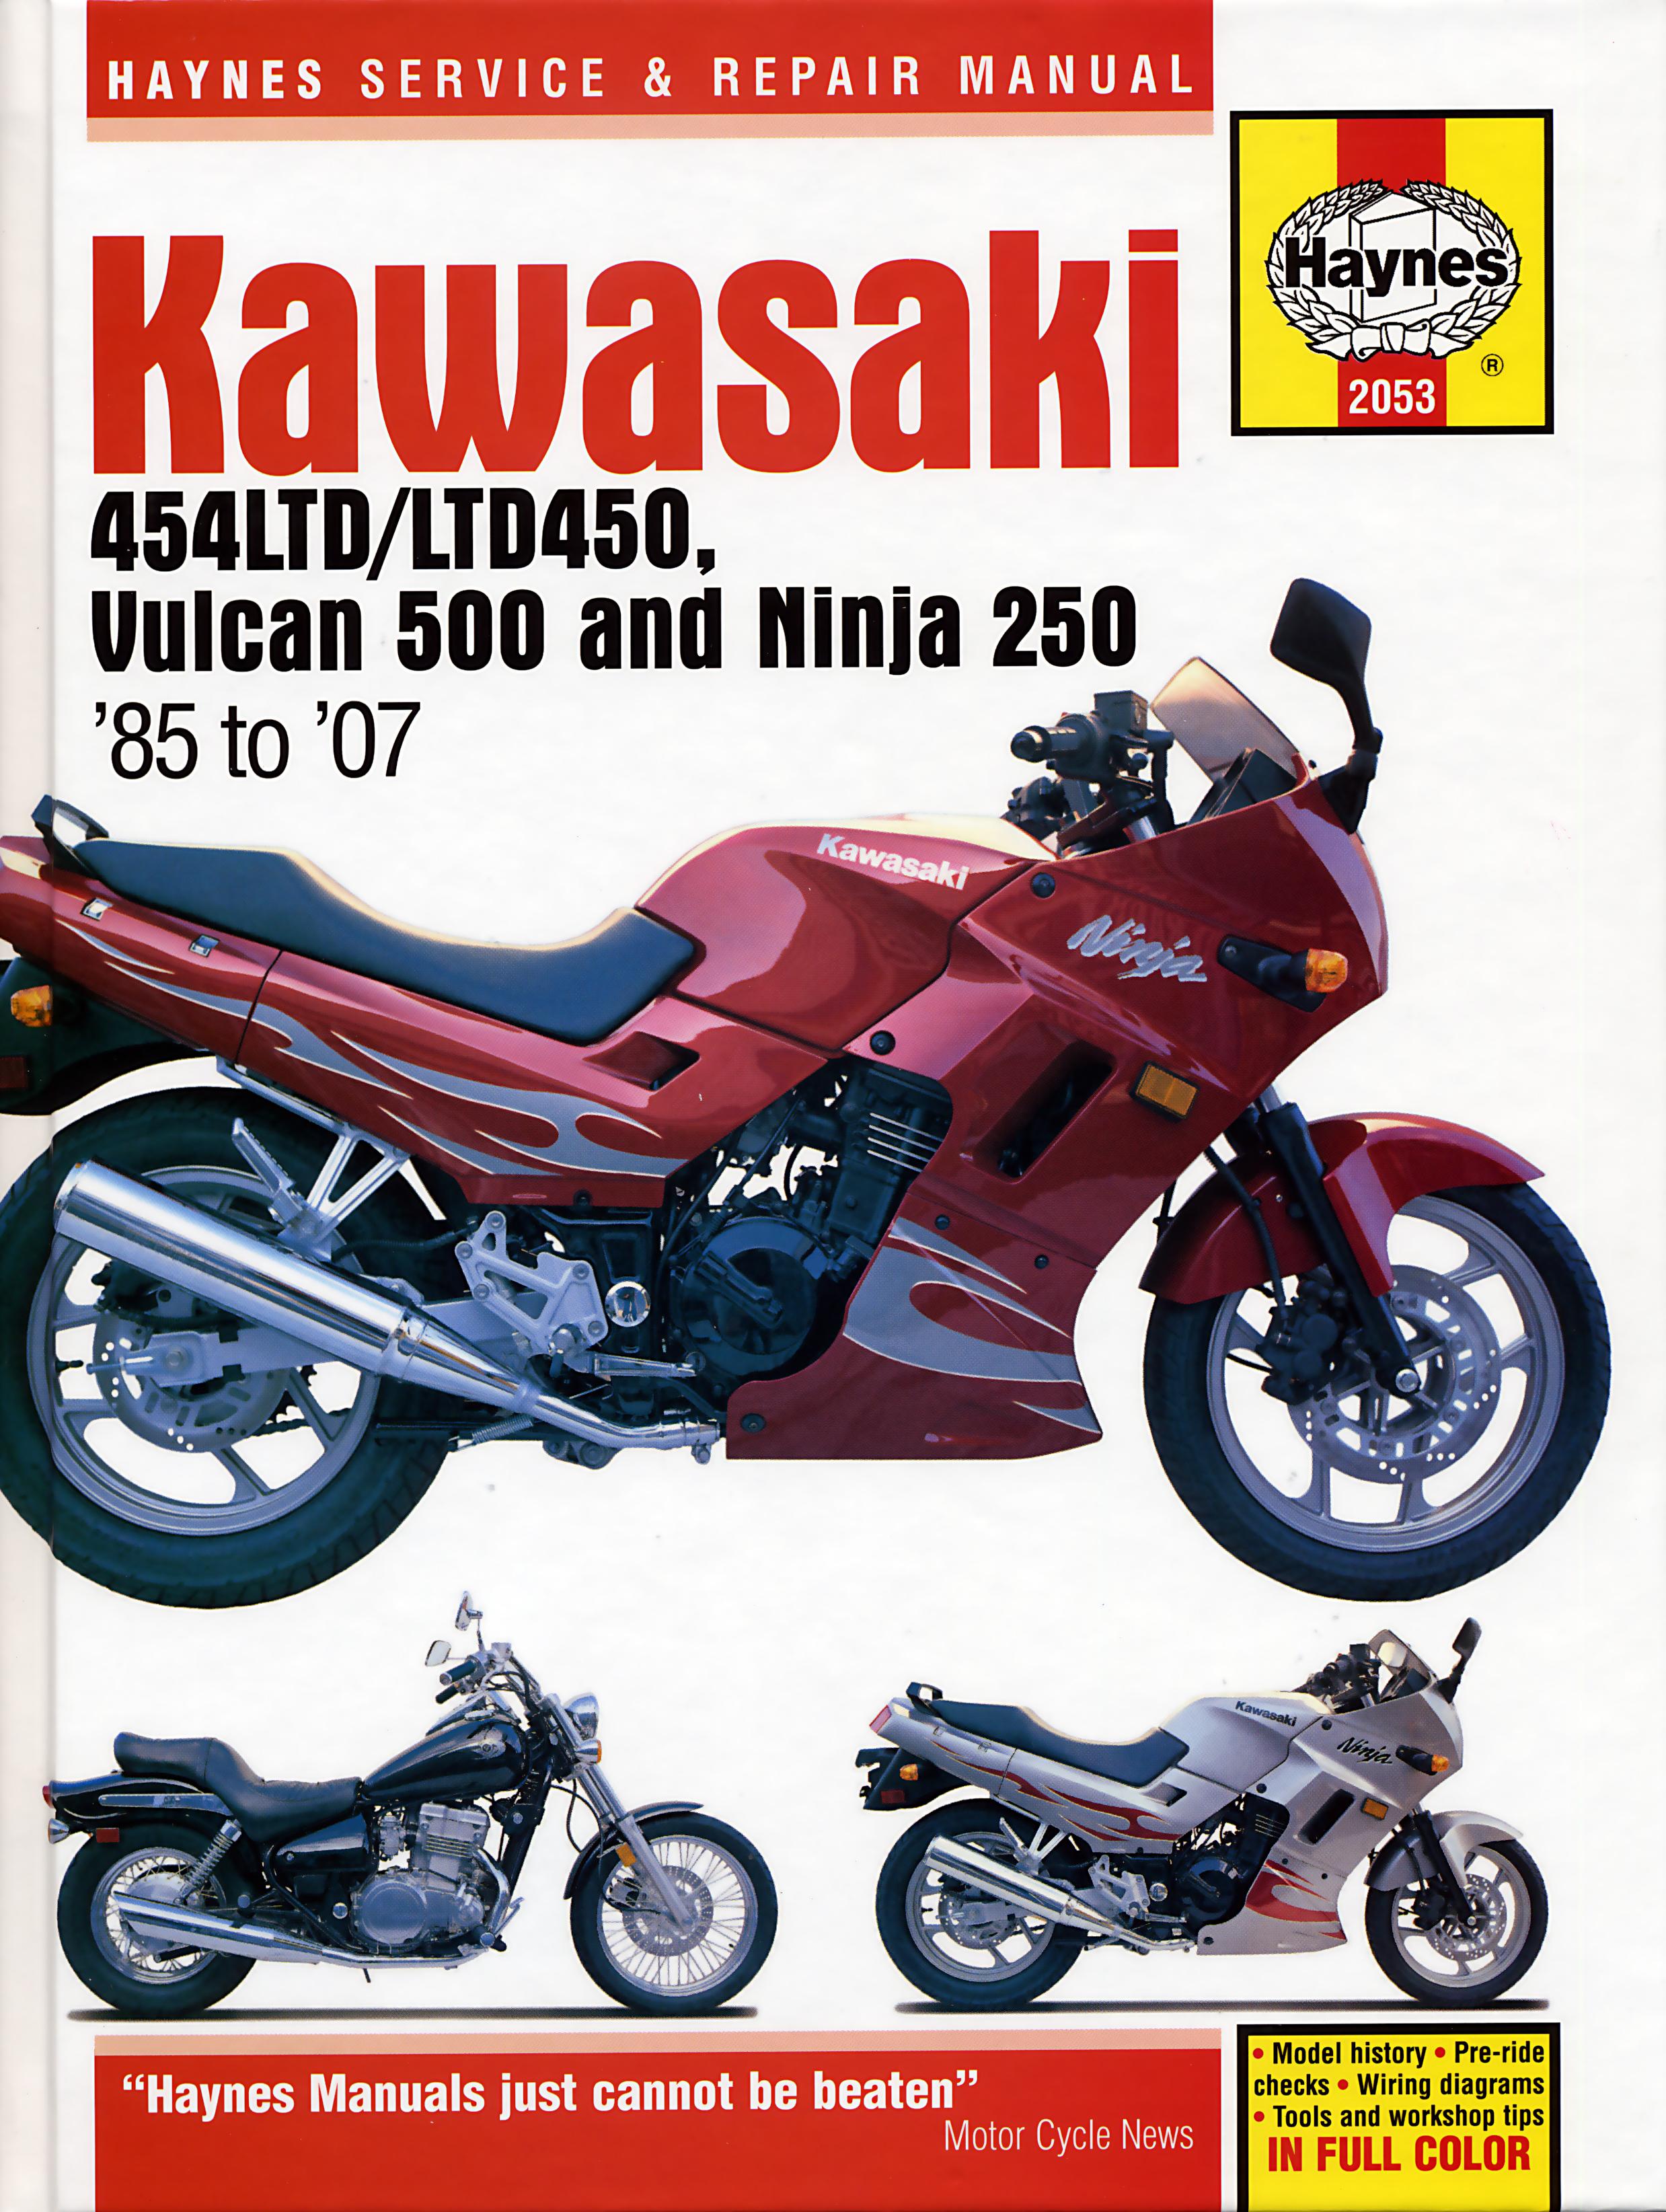 Wiring Diagram For 85 Kawasaki Ninja 6 Worksheet And 2008 250 En450 454ltd Ltd450 90 En500 Vulcan 500 07 Rh Haynes Com Diagrams Abs Brake